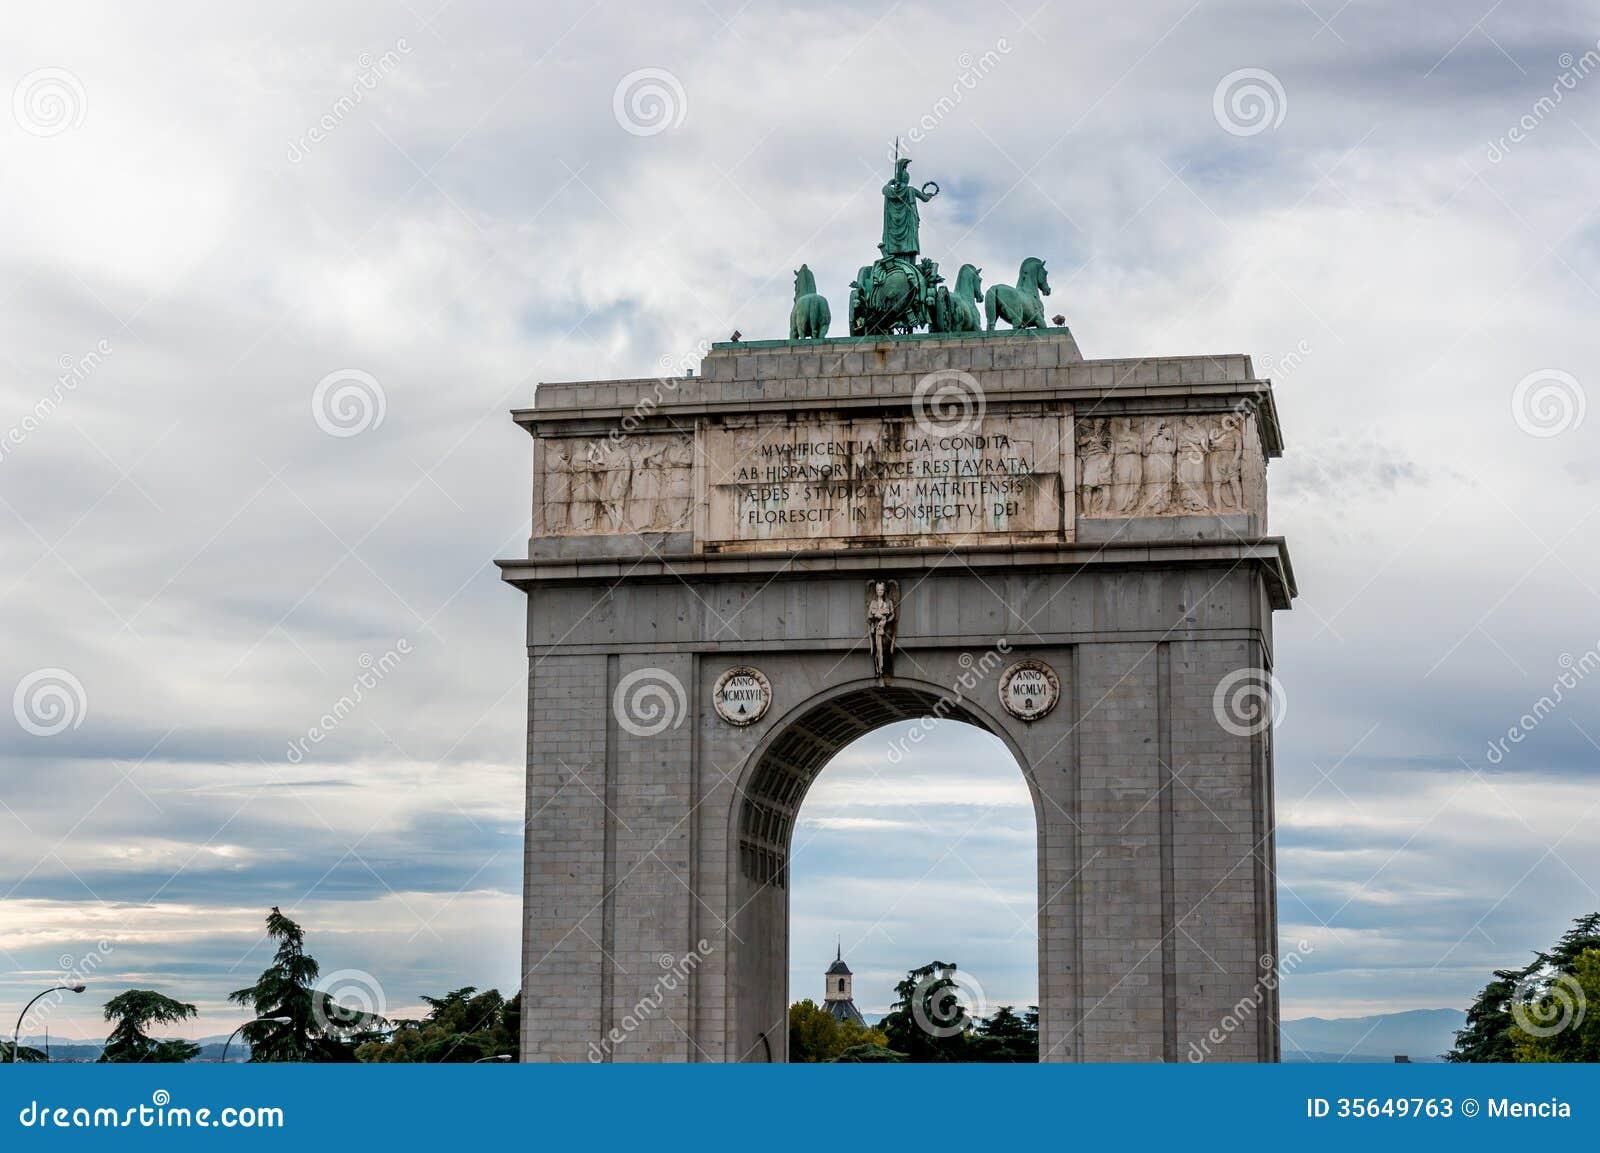 Arco Del Triunfo De Madrid Stock Image Image Of Historical 35649763